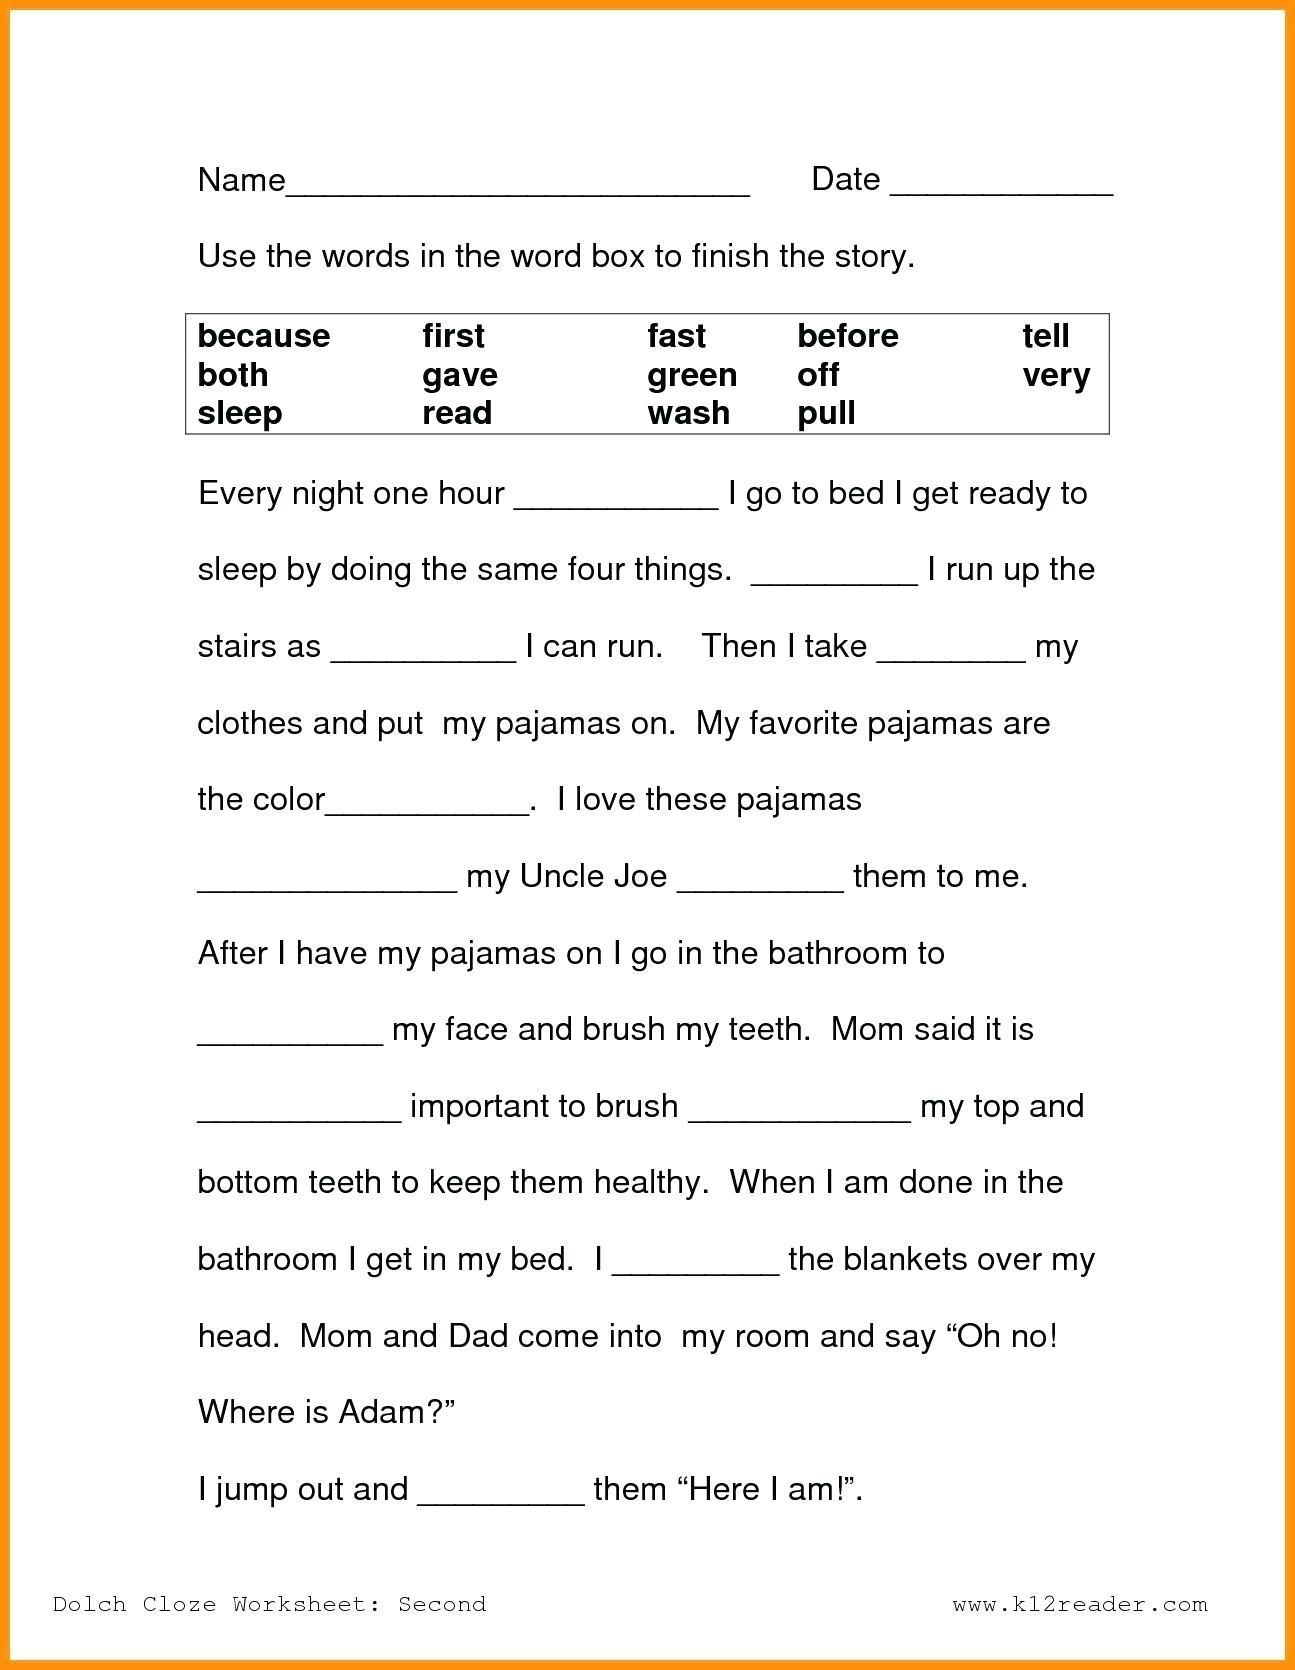 First Grade Reading Worksheets Free 1st Printable First Grade Worksheets Readi In 2021 2nd Grade Reading Worksheets Reading Comprehension Worksheets Reading Worksheets